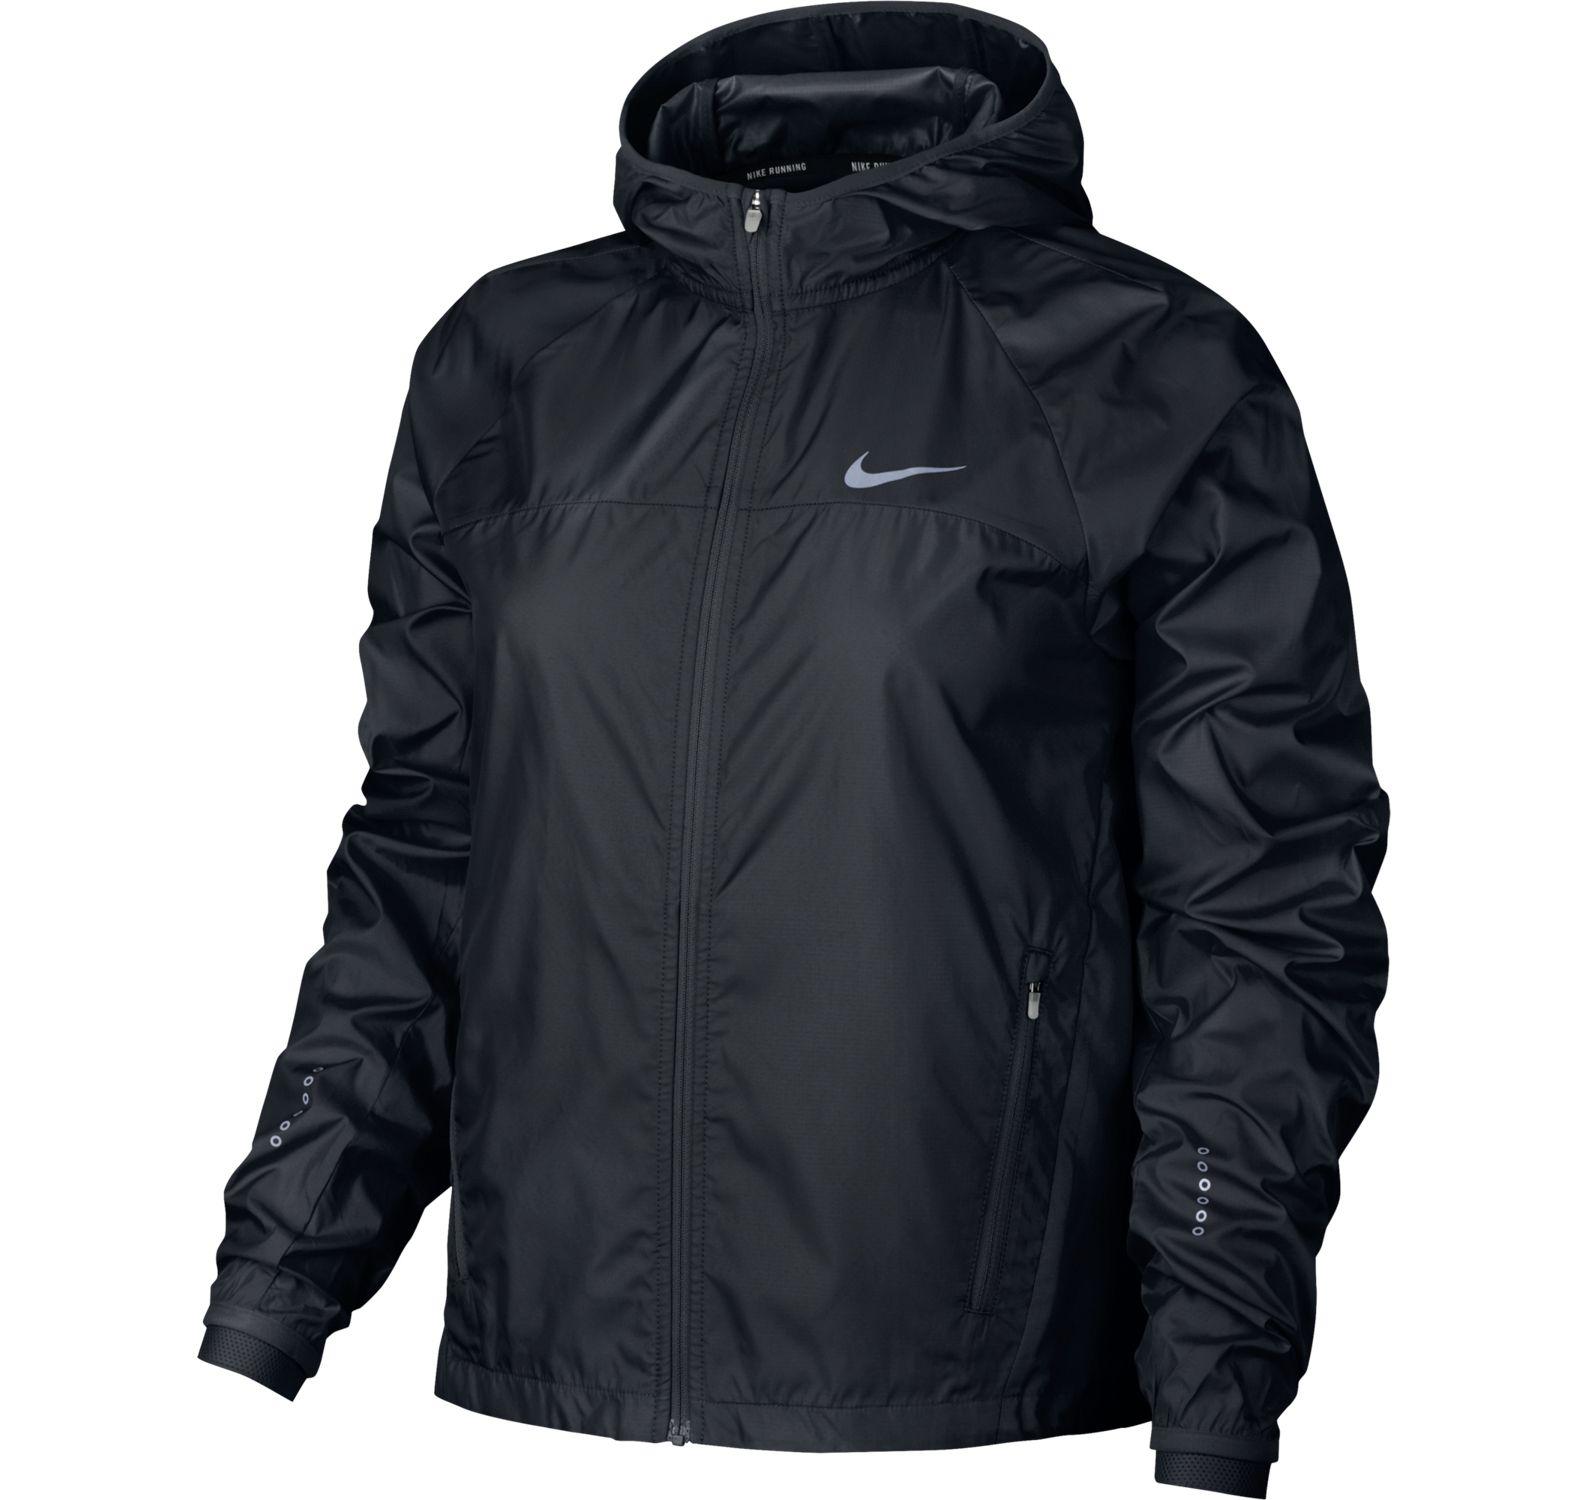 W Nk Shld Jkt Hd Racer, Black, M,  Nike